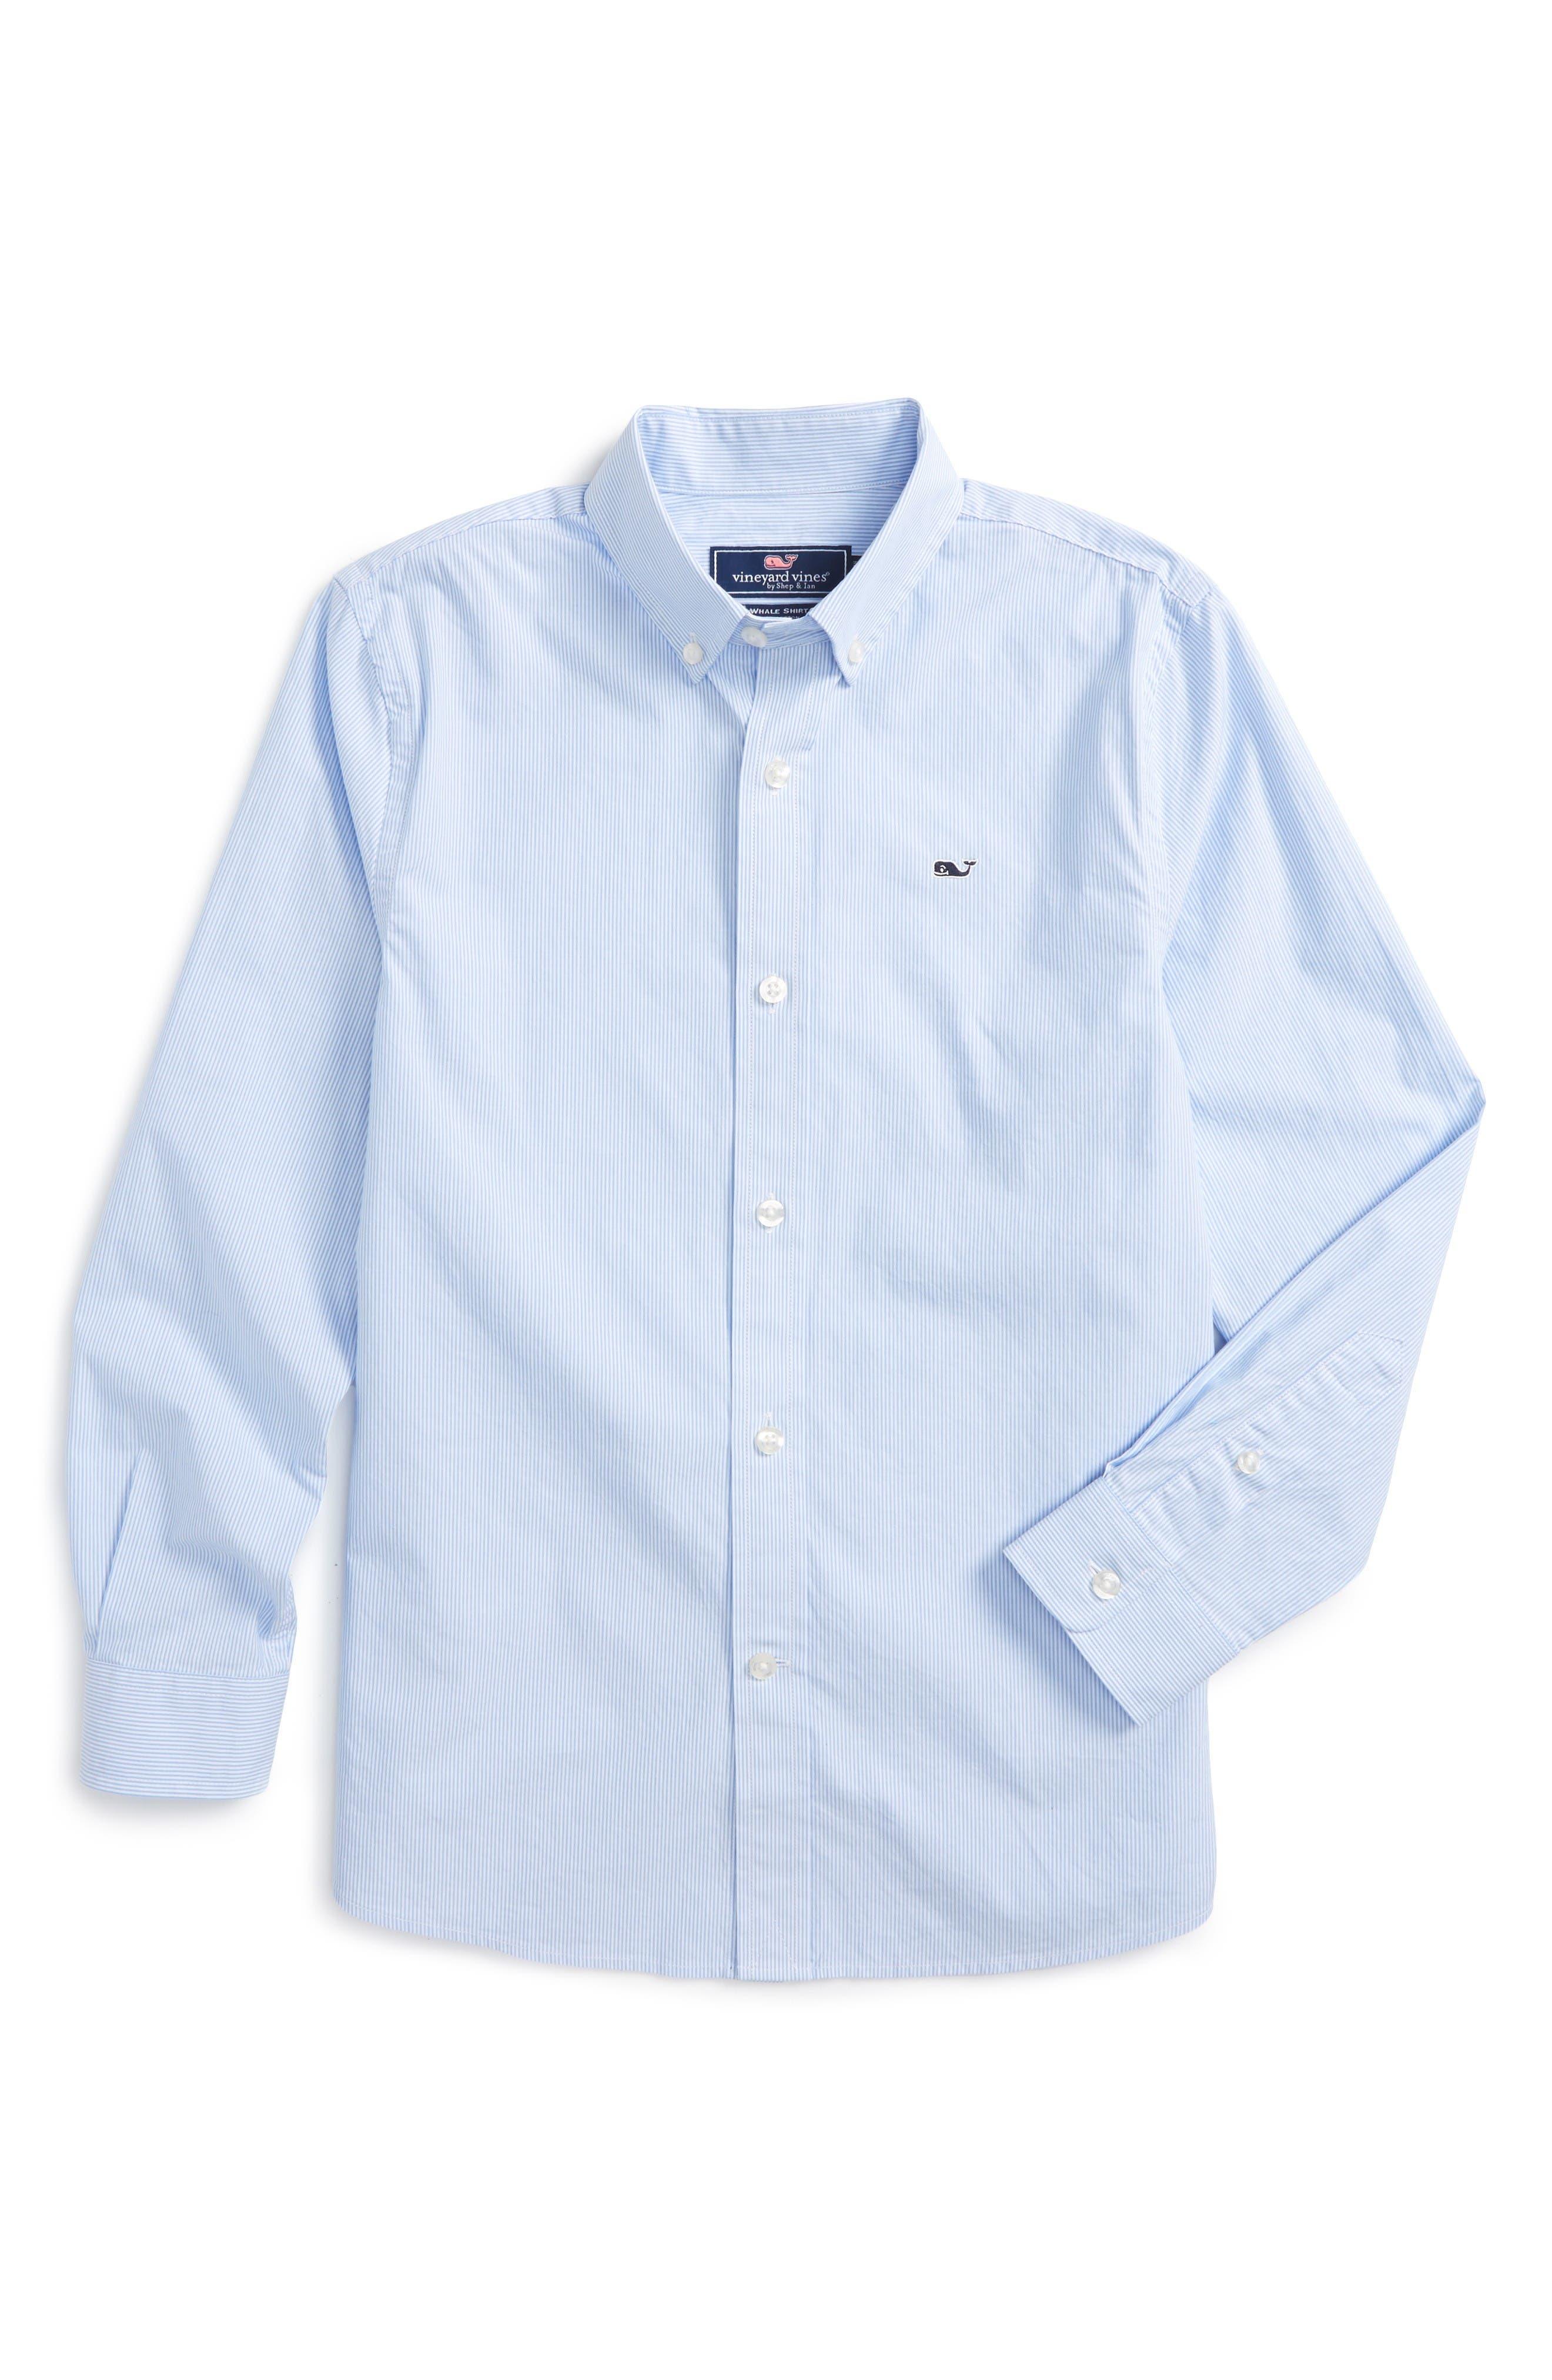 Main Image - Vineyard Vines Fine Line Stripe - Whale Woven Shirt (Big Boys)